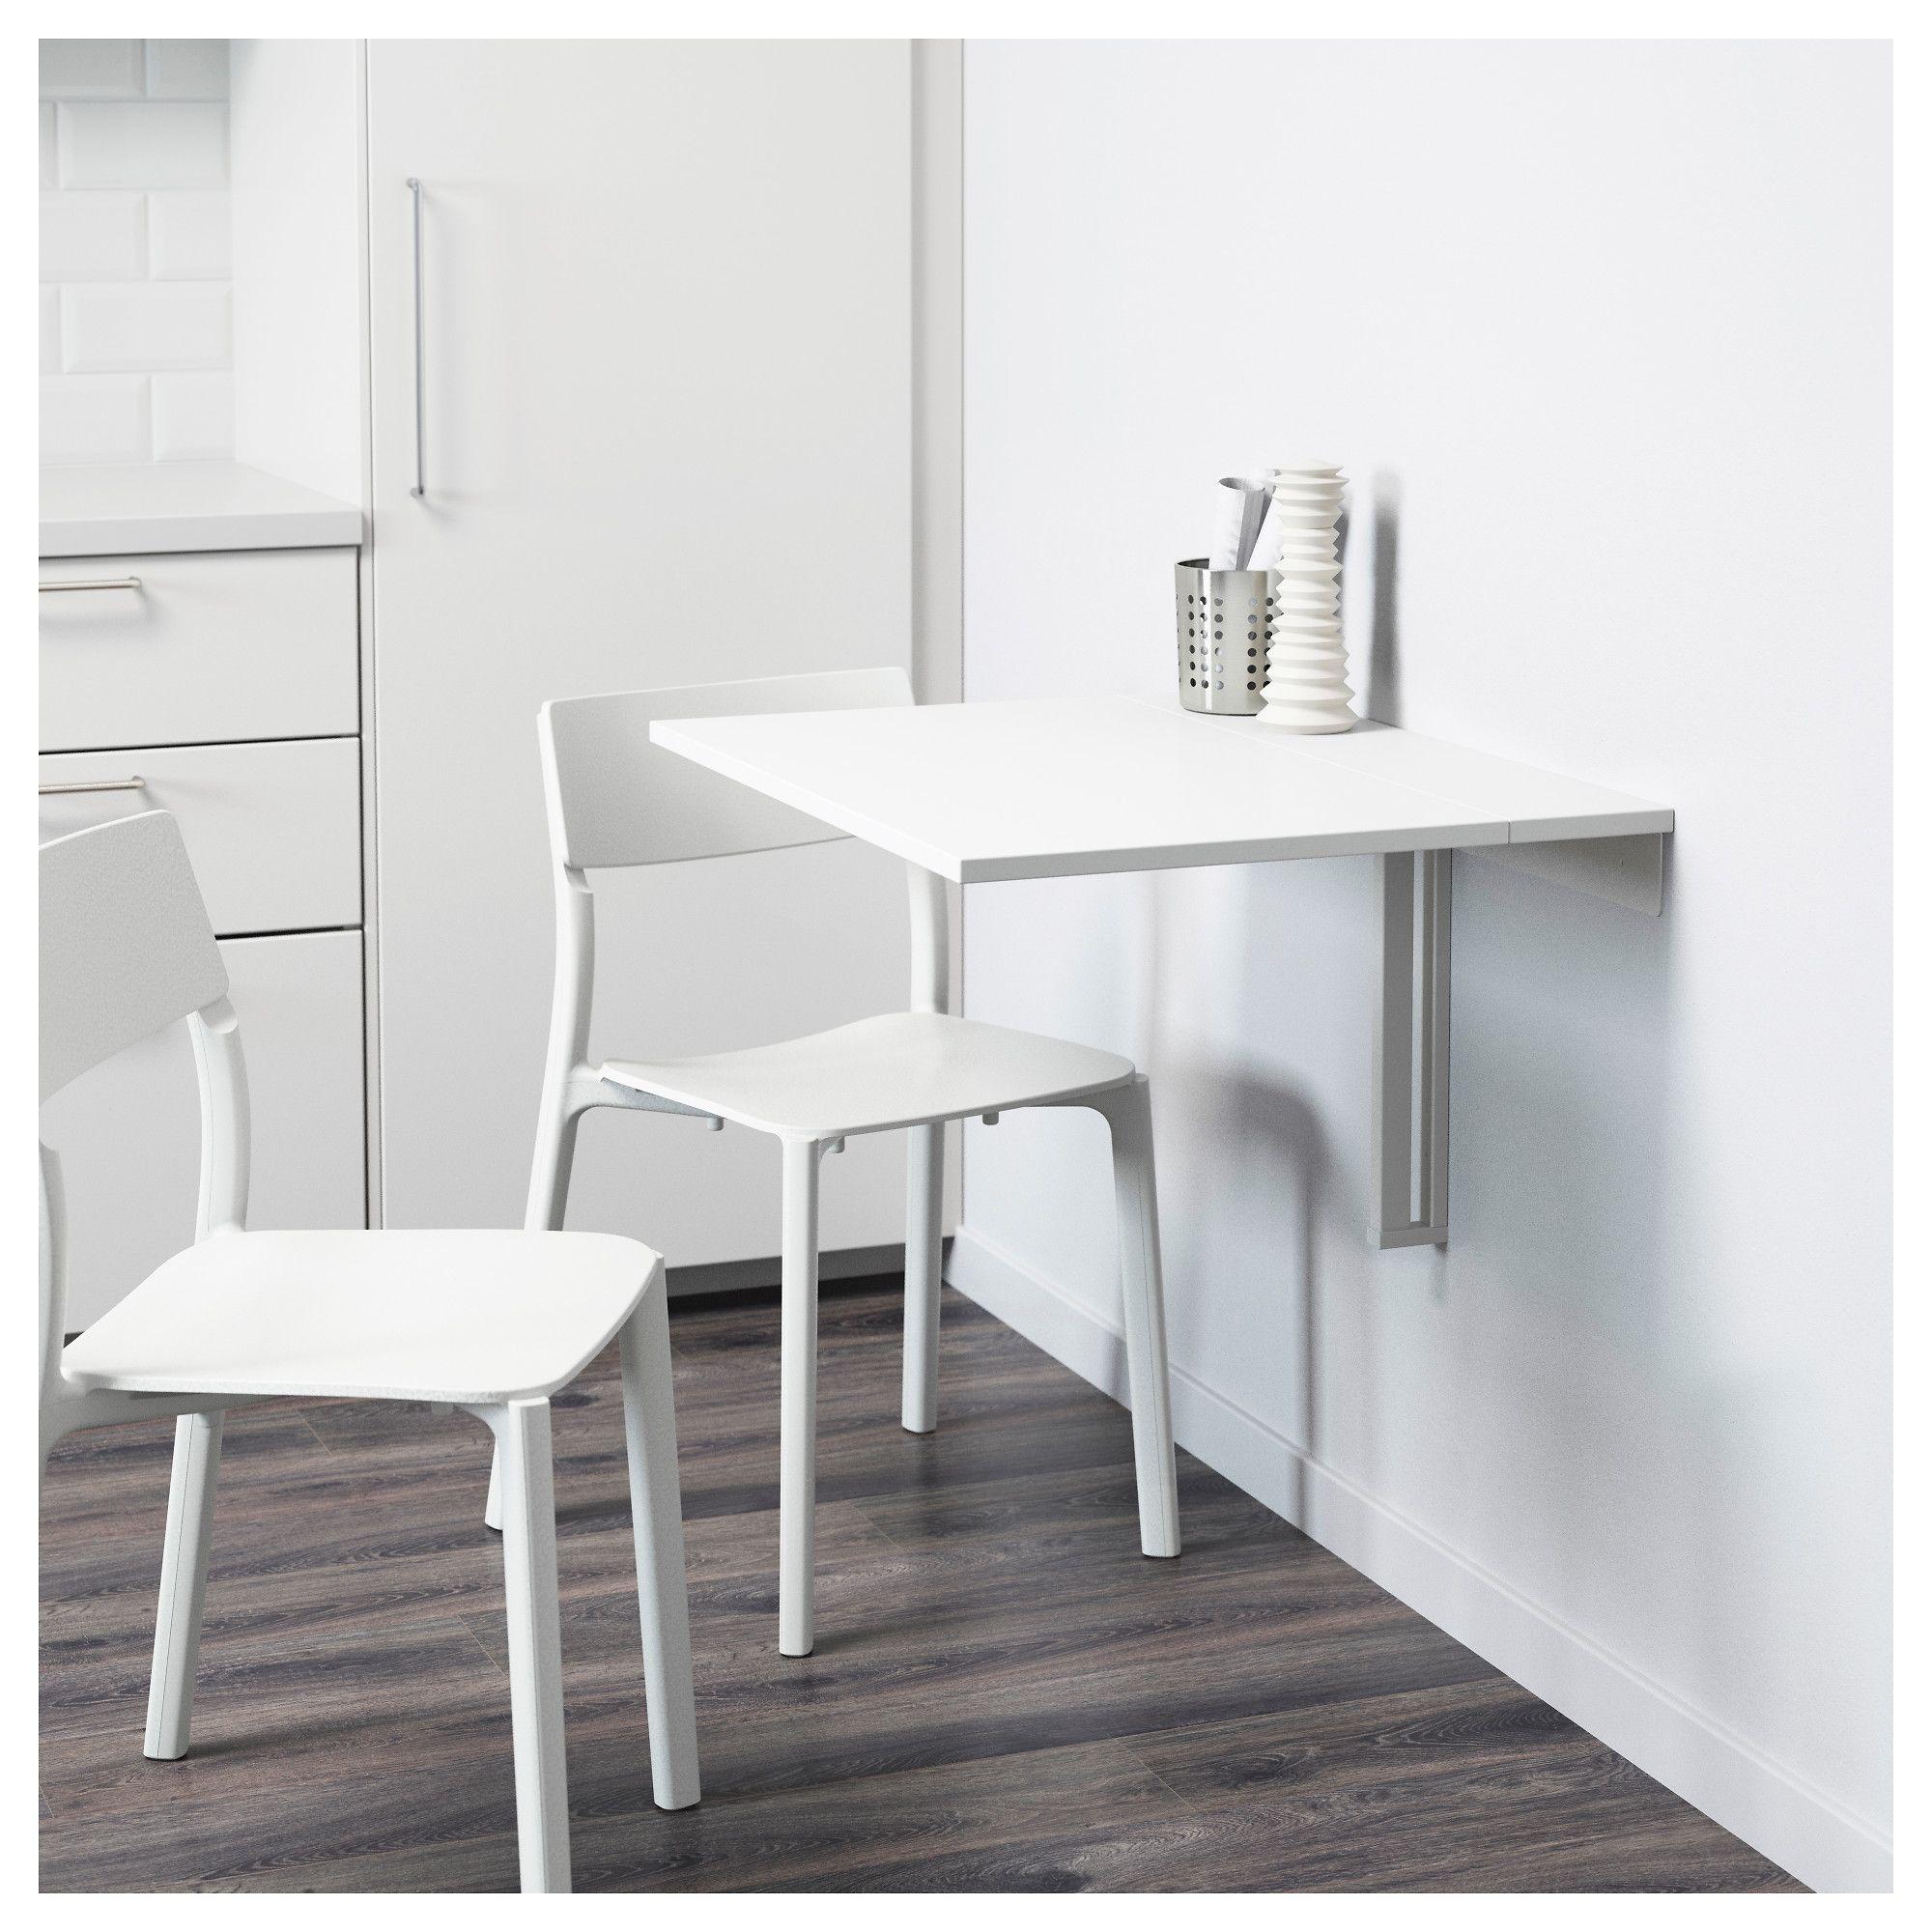 Norberg Wall Mounted Drop Leaf Table Ikea Drop Leaf Table